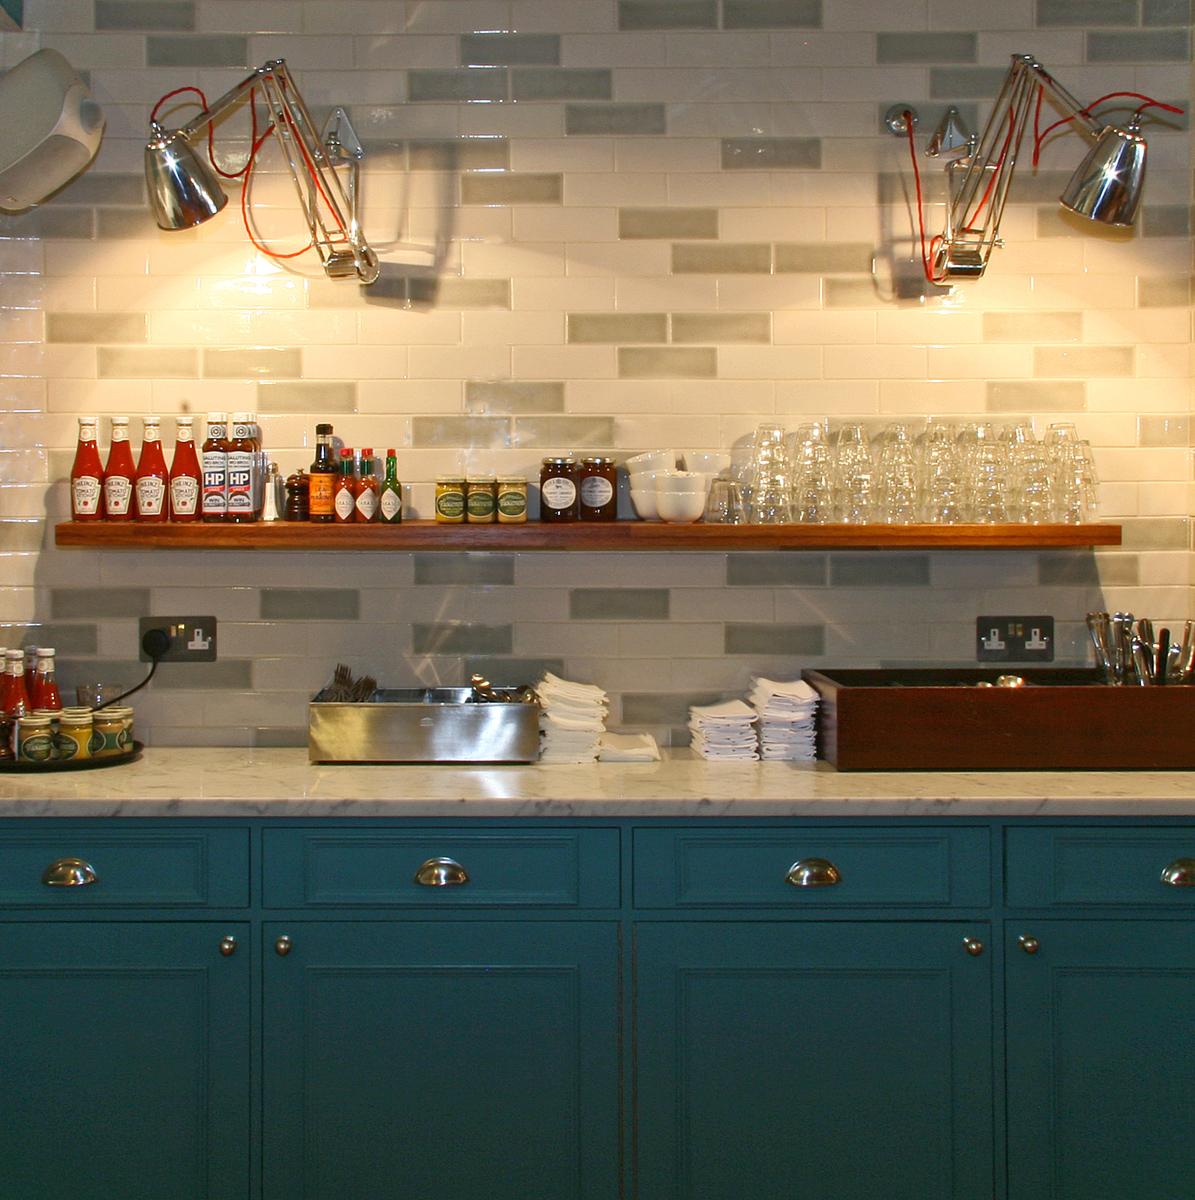 portabello_restaurant_oxford_rogue_designs_03.jpg